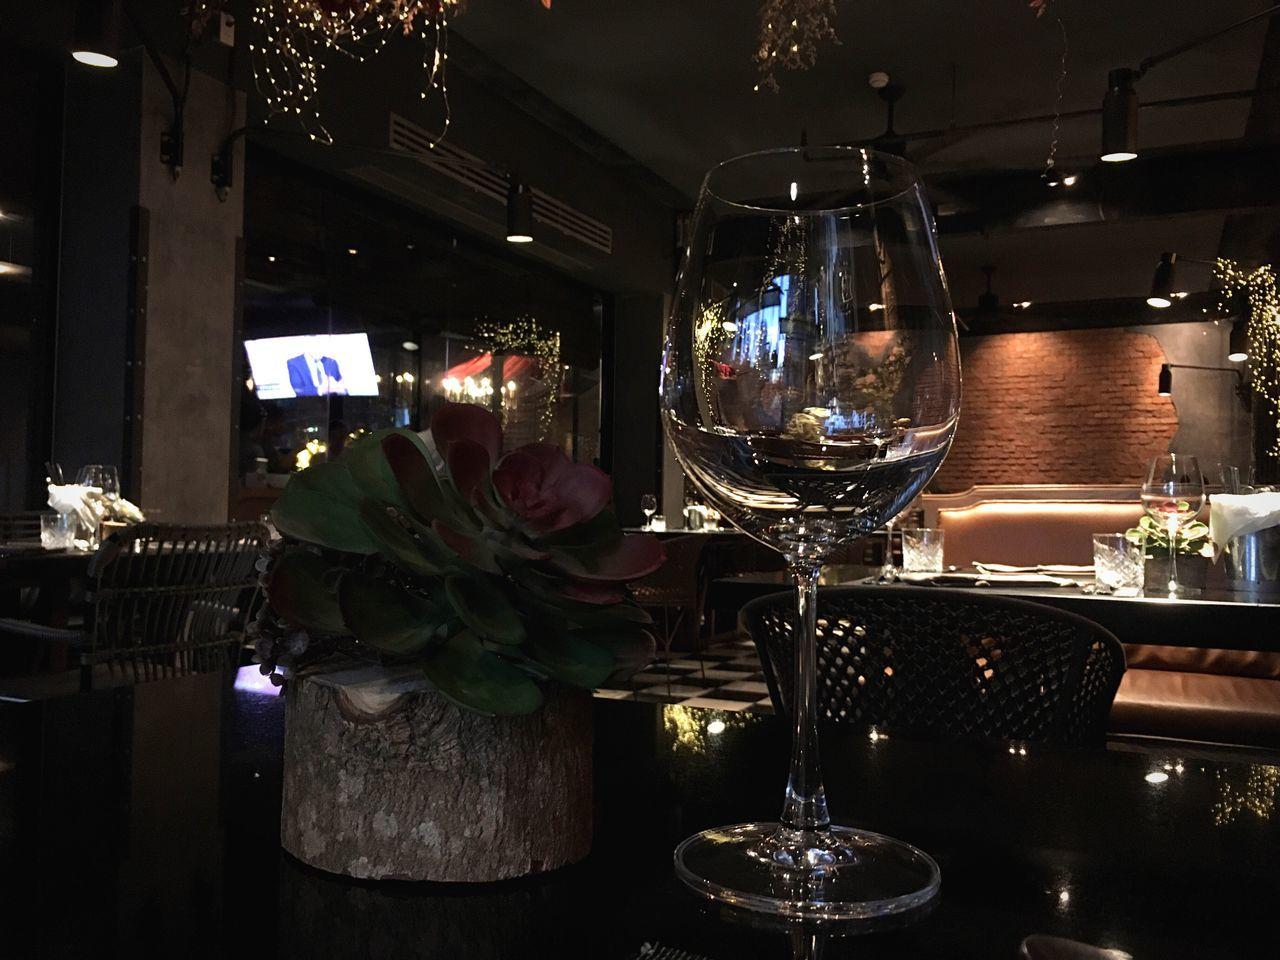 Flower Indoors  Table Arrangement Bouquet Night Illuminated No People Freshness Wineglass Hanging Food